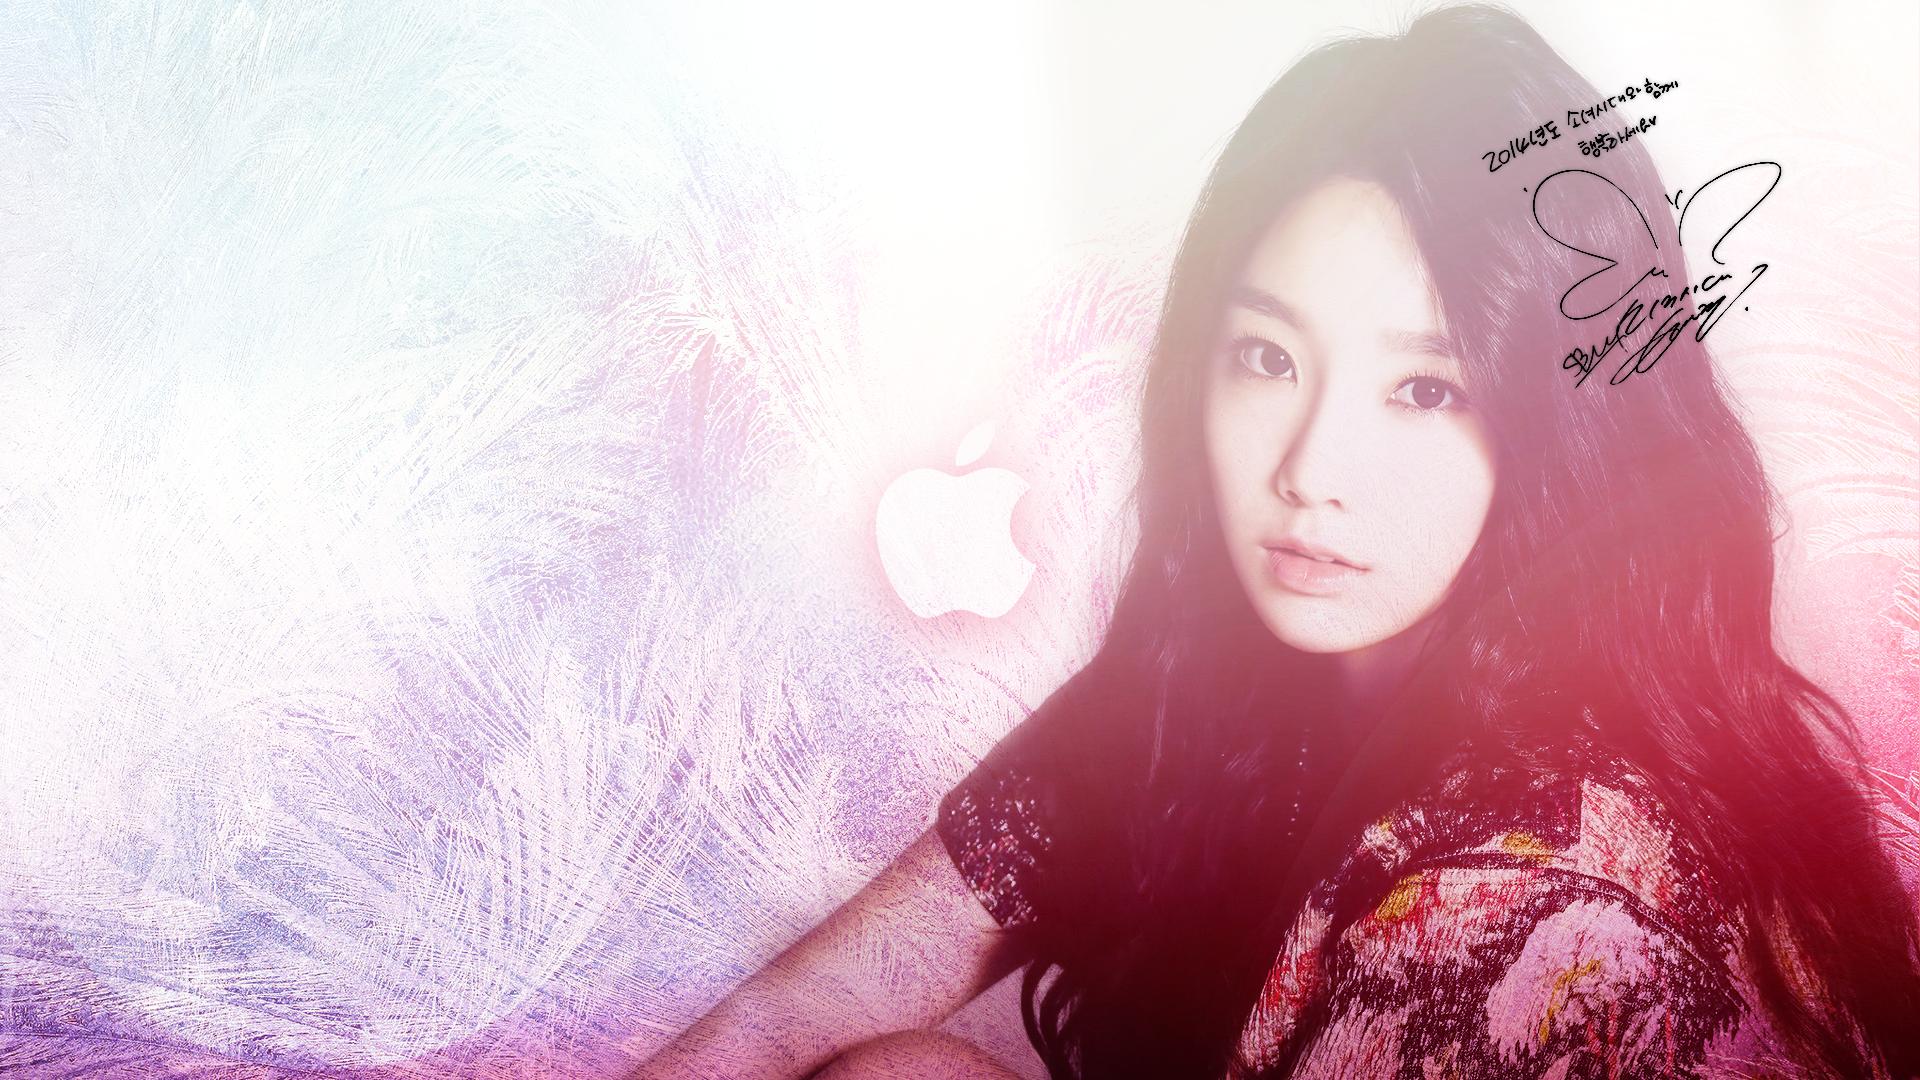 Precious Taeyeon wallpaper Taeyeon태연 Pinterest Wallpaper